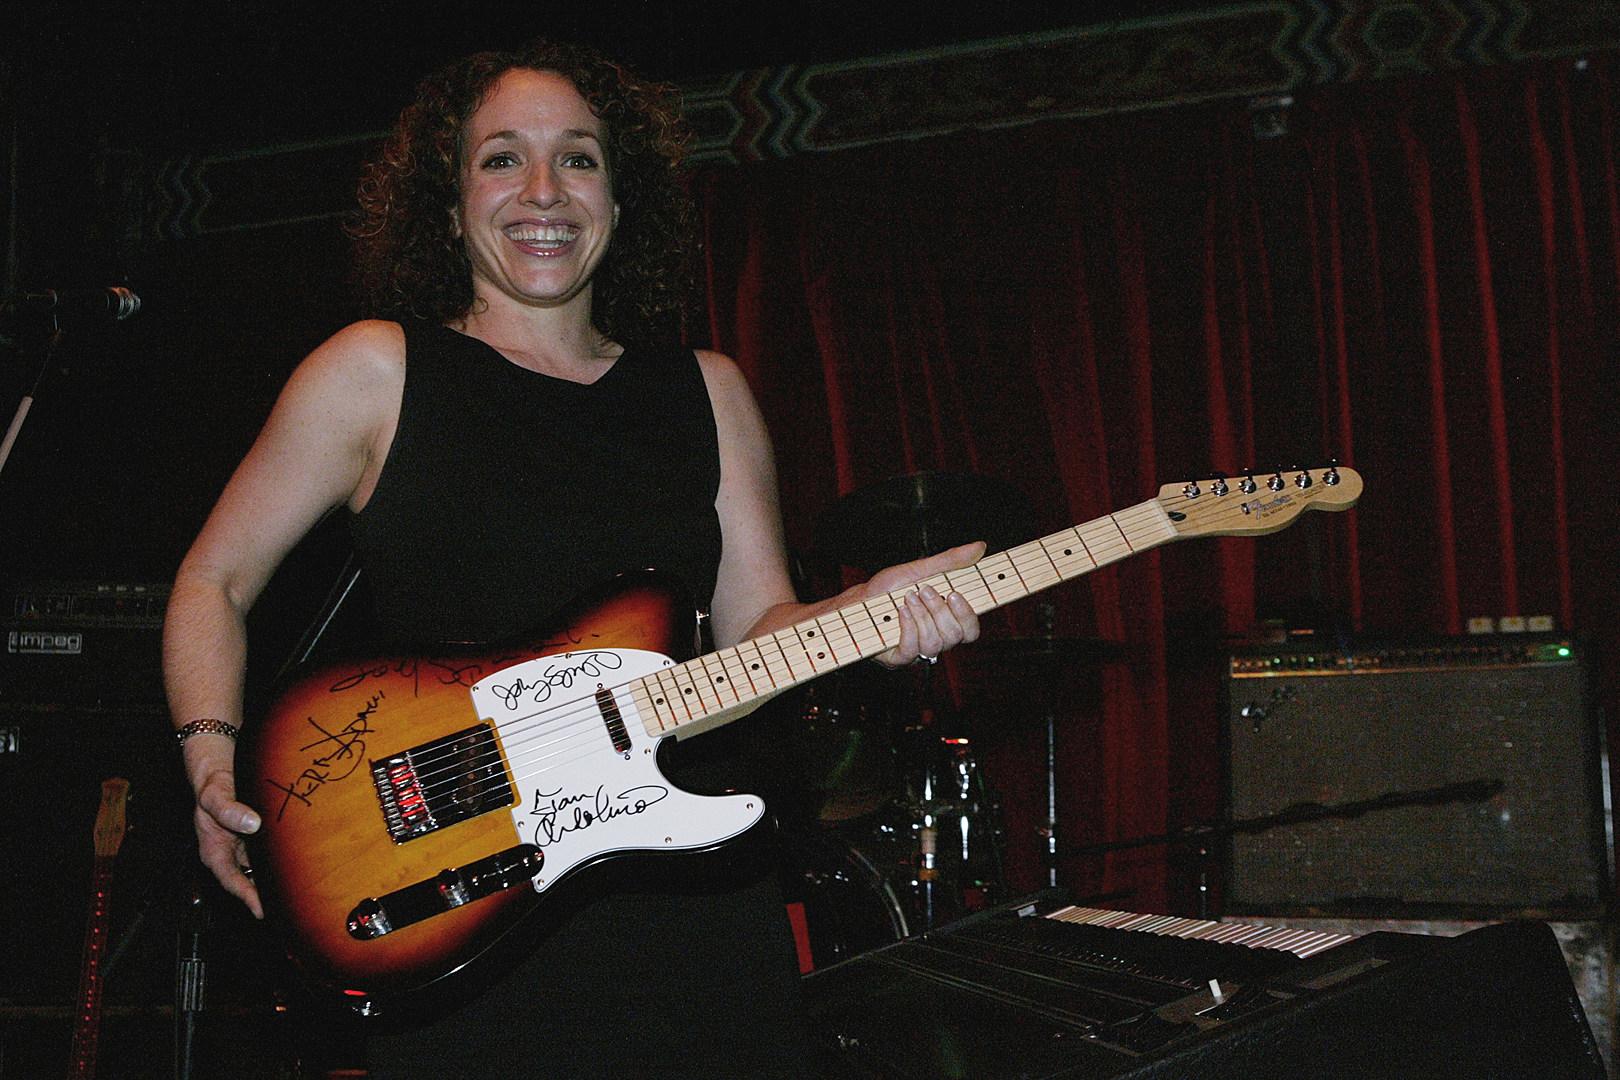 Report: Fender Study Reveals Women Make Up 50 Percent of Beginning Players